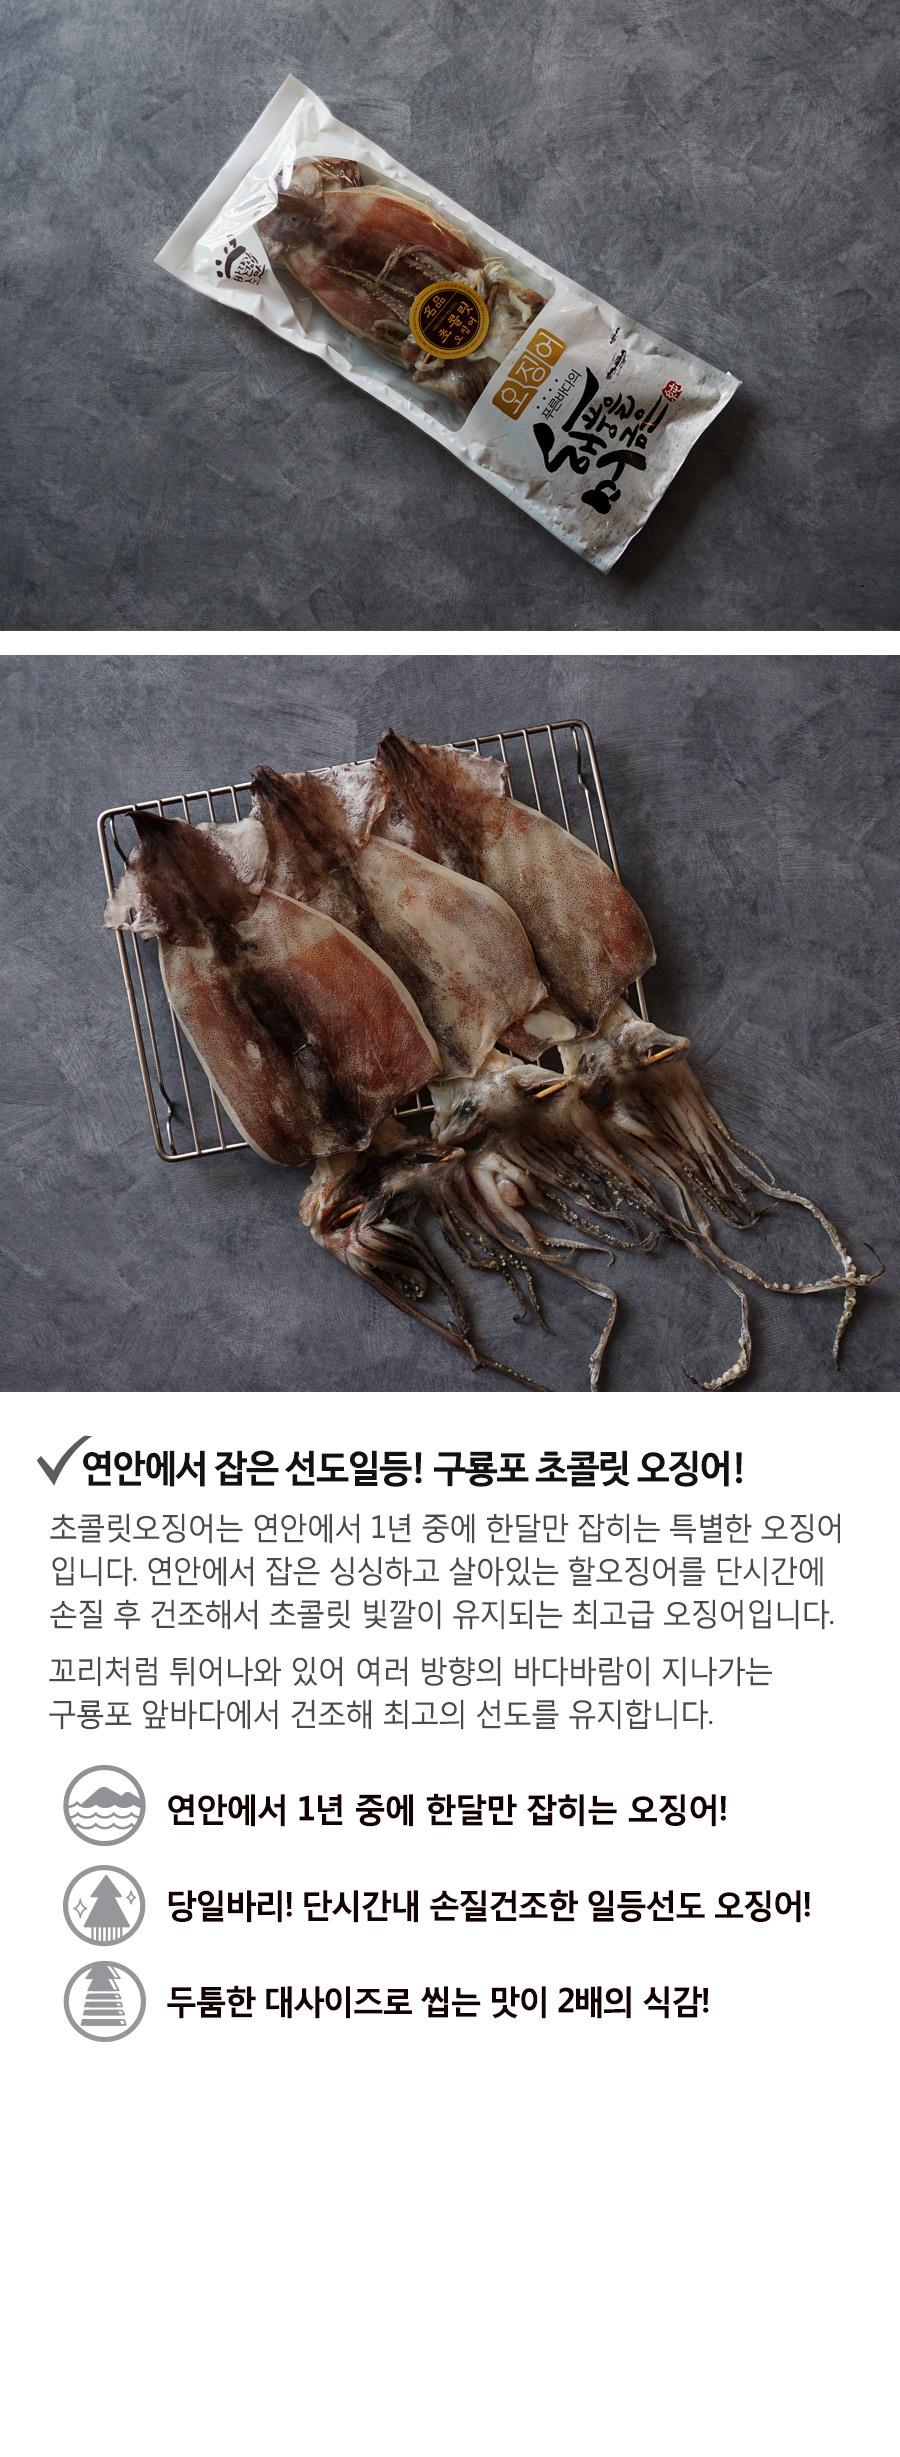 반건조 오징어